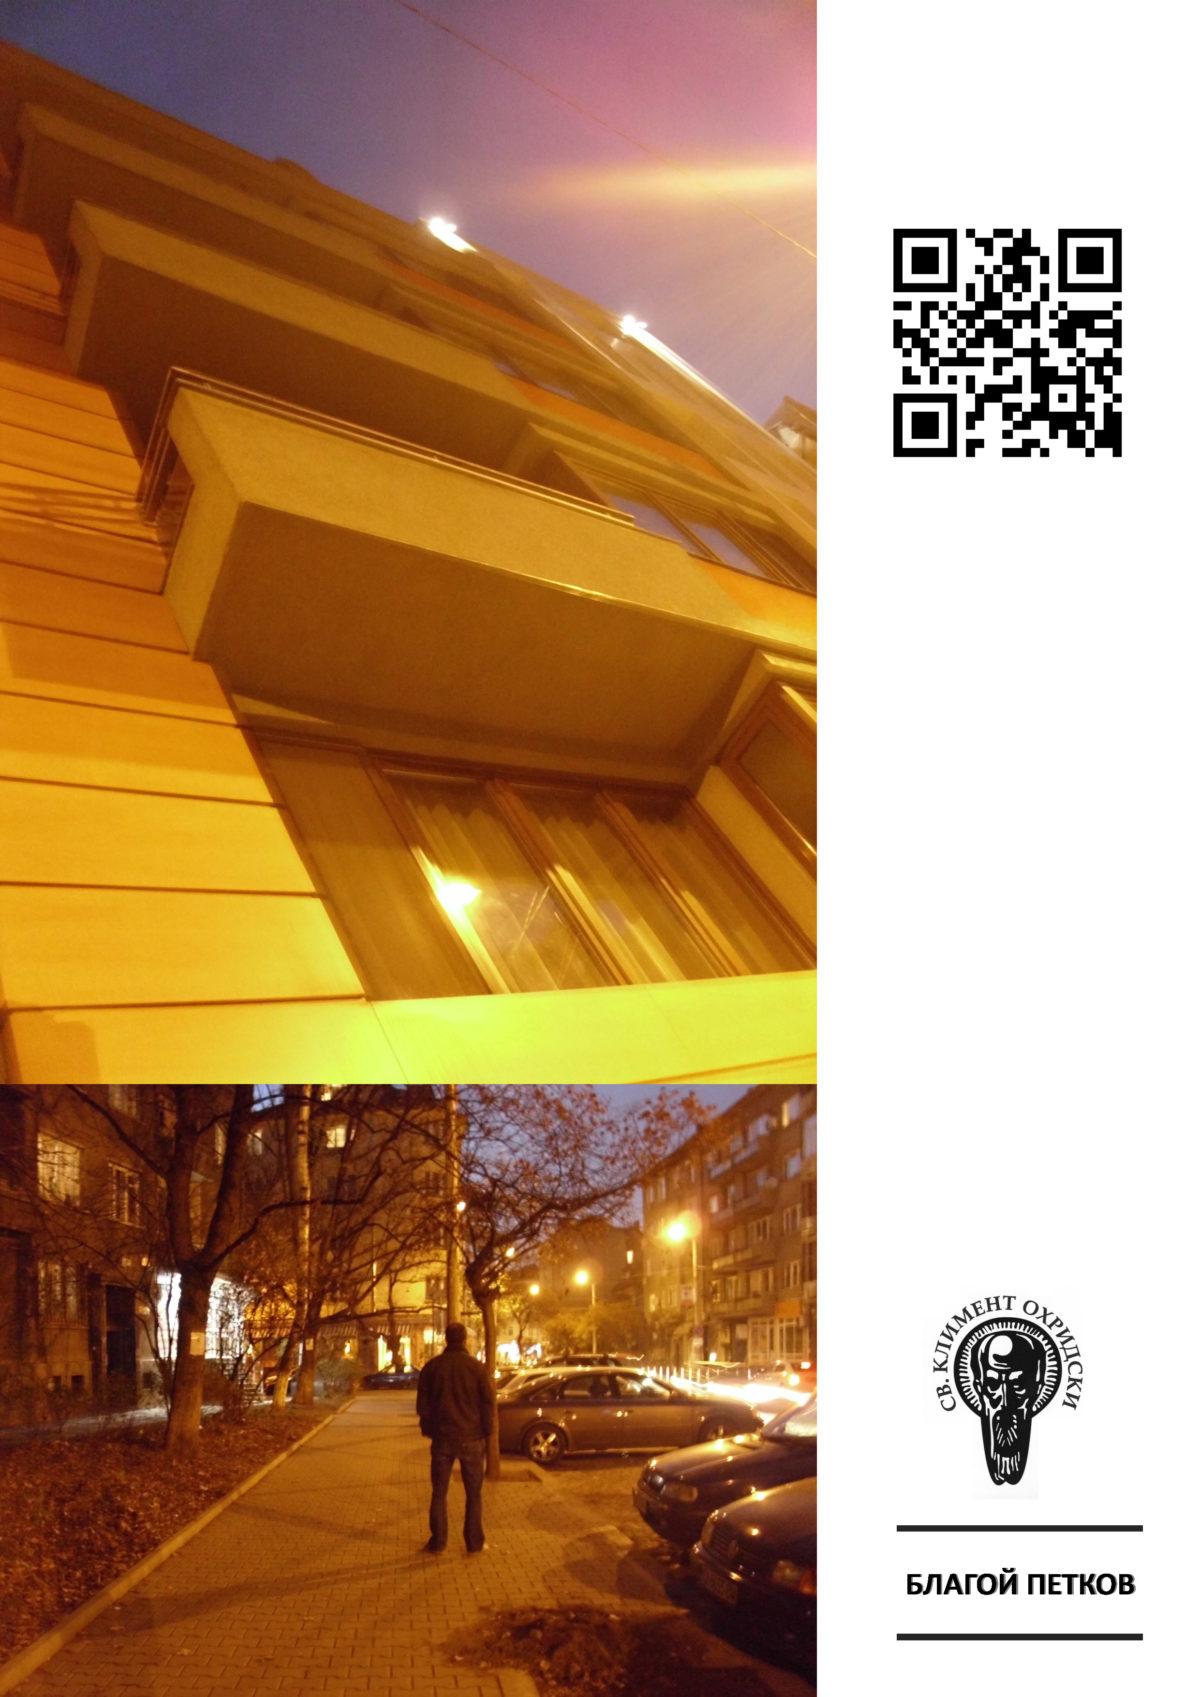 http://www.petkovstudio.com/bg/wp-content/uploads/2011/02/ivanasen_Page_20-1200x1697.jpg